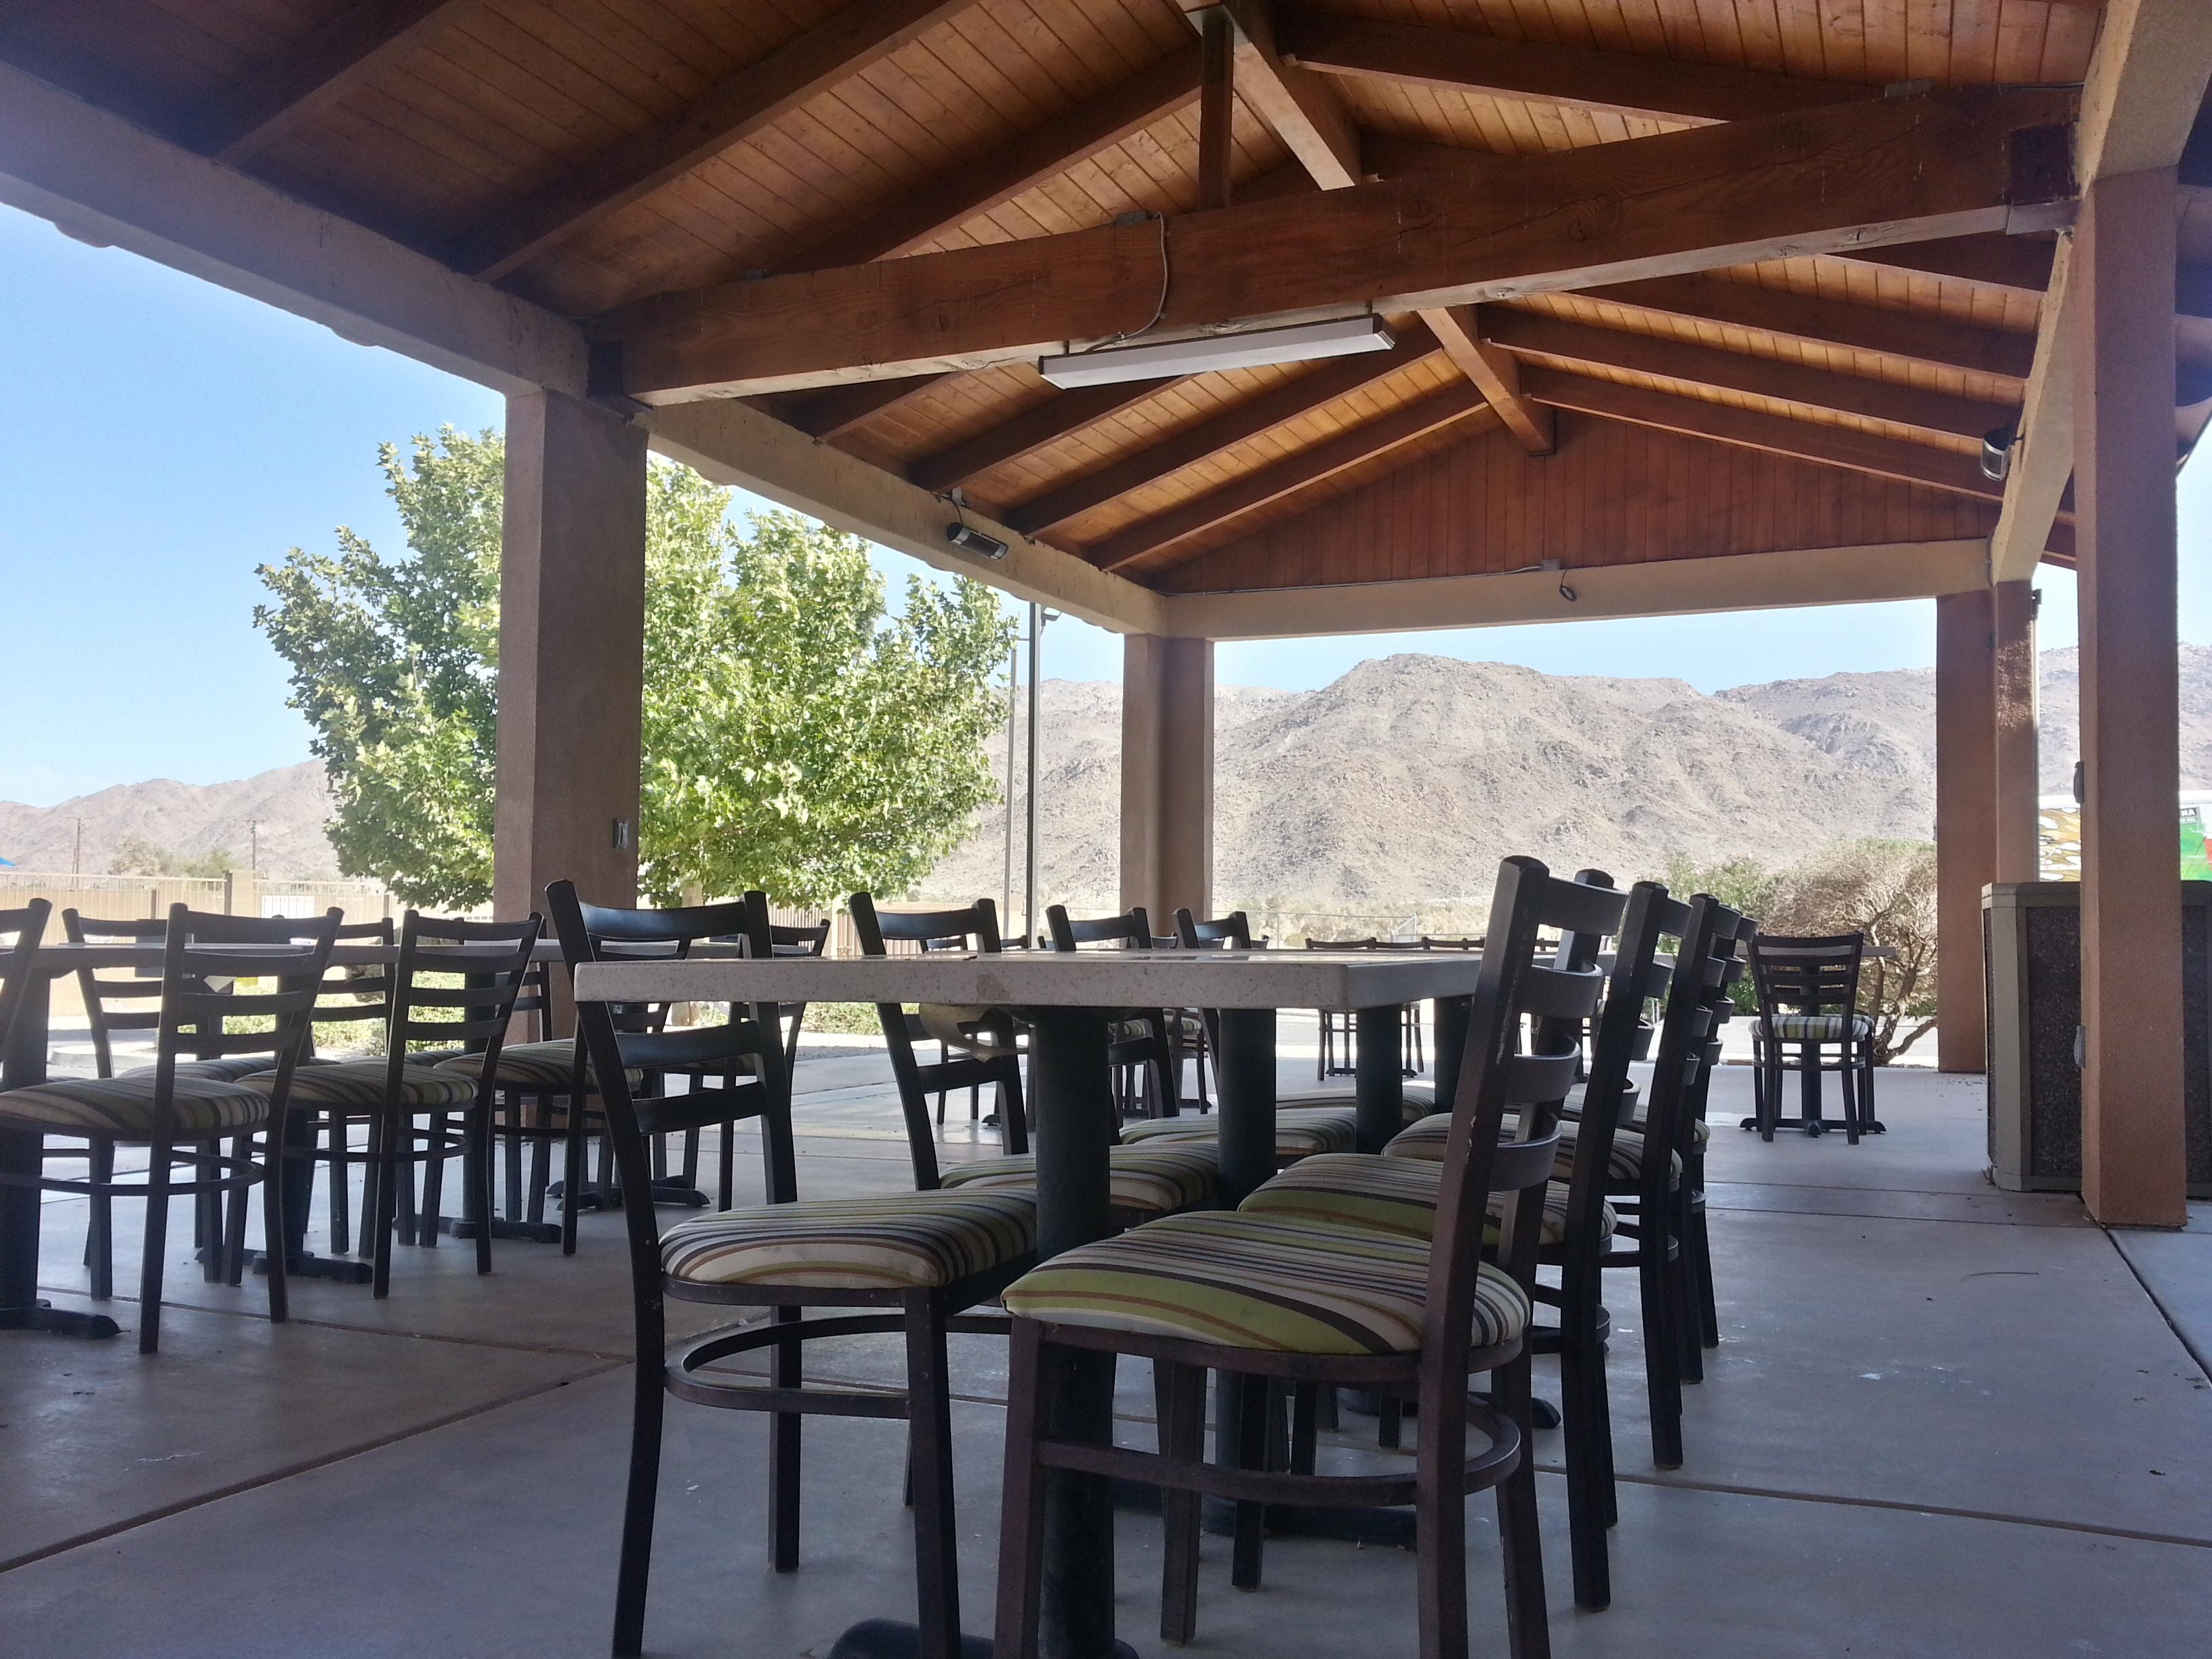 Restaurants in 29 palms ca / Beach resorts in ft lauderdale